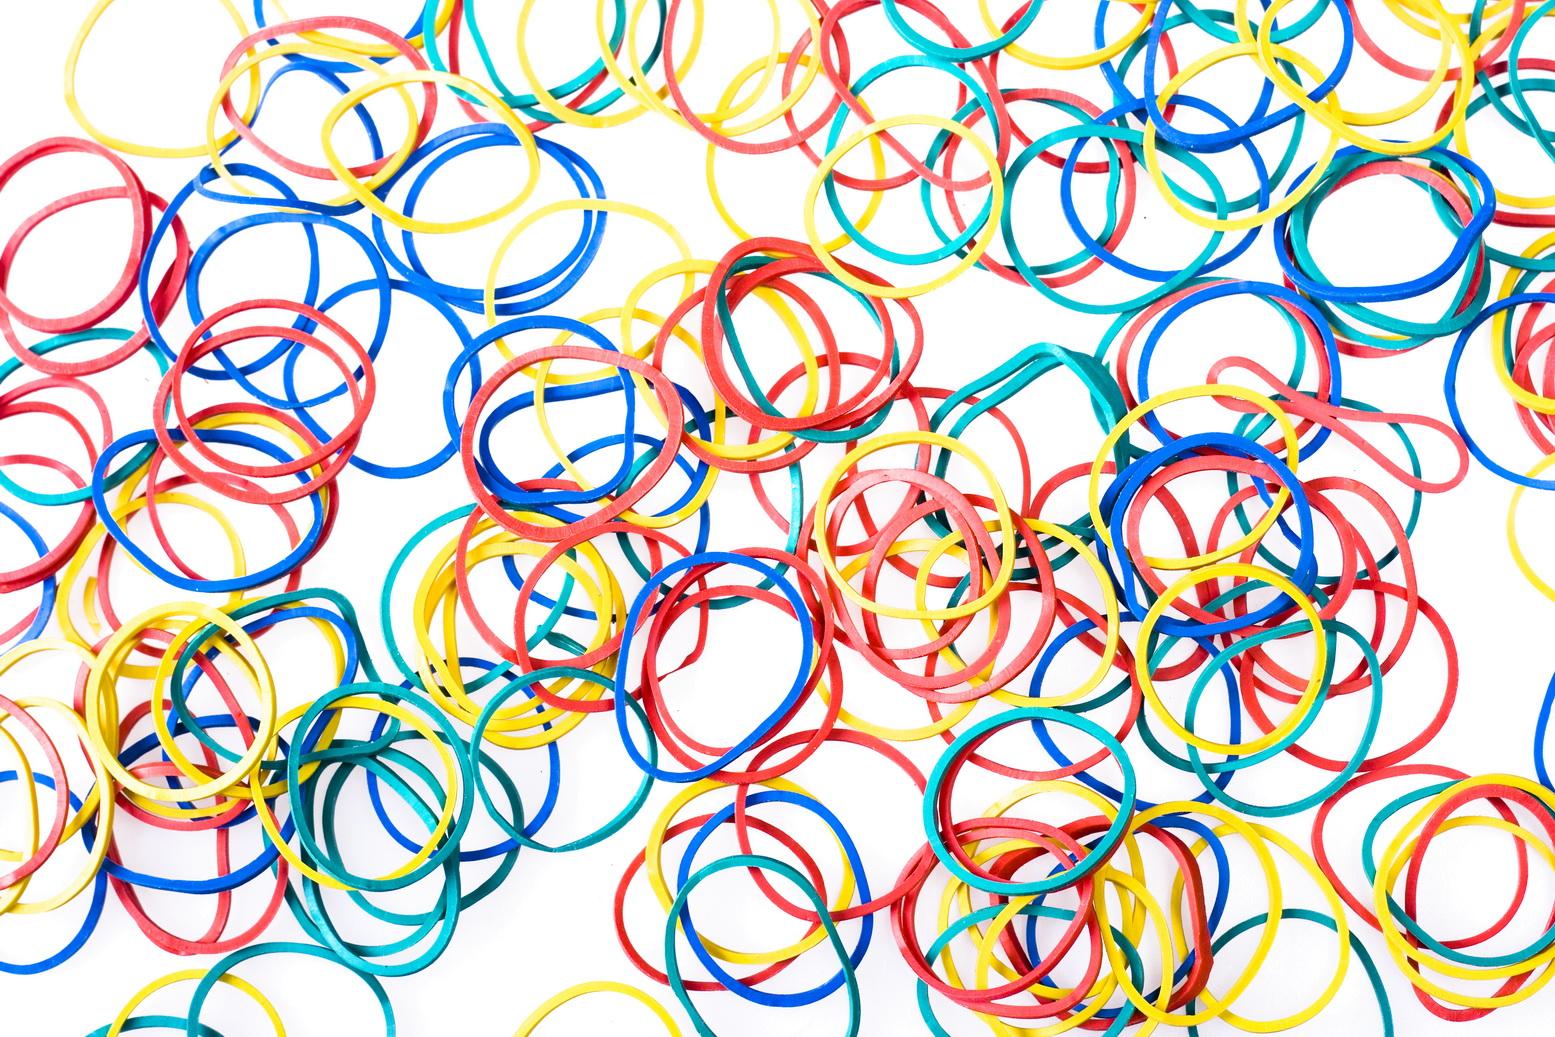 color circles, Ornaments, Vibrant, Texture, Swirl, HQ Photo